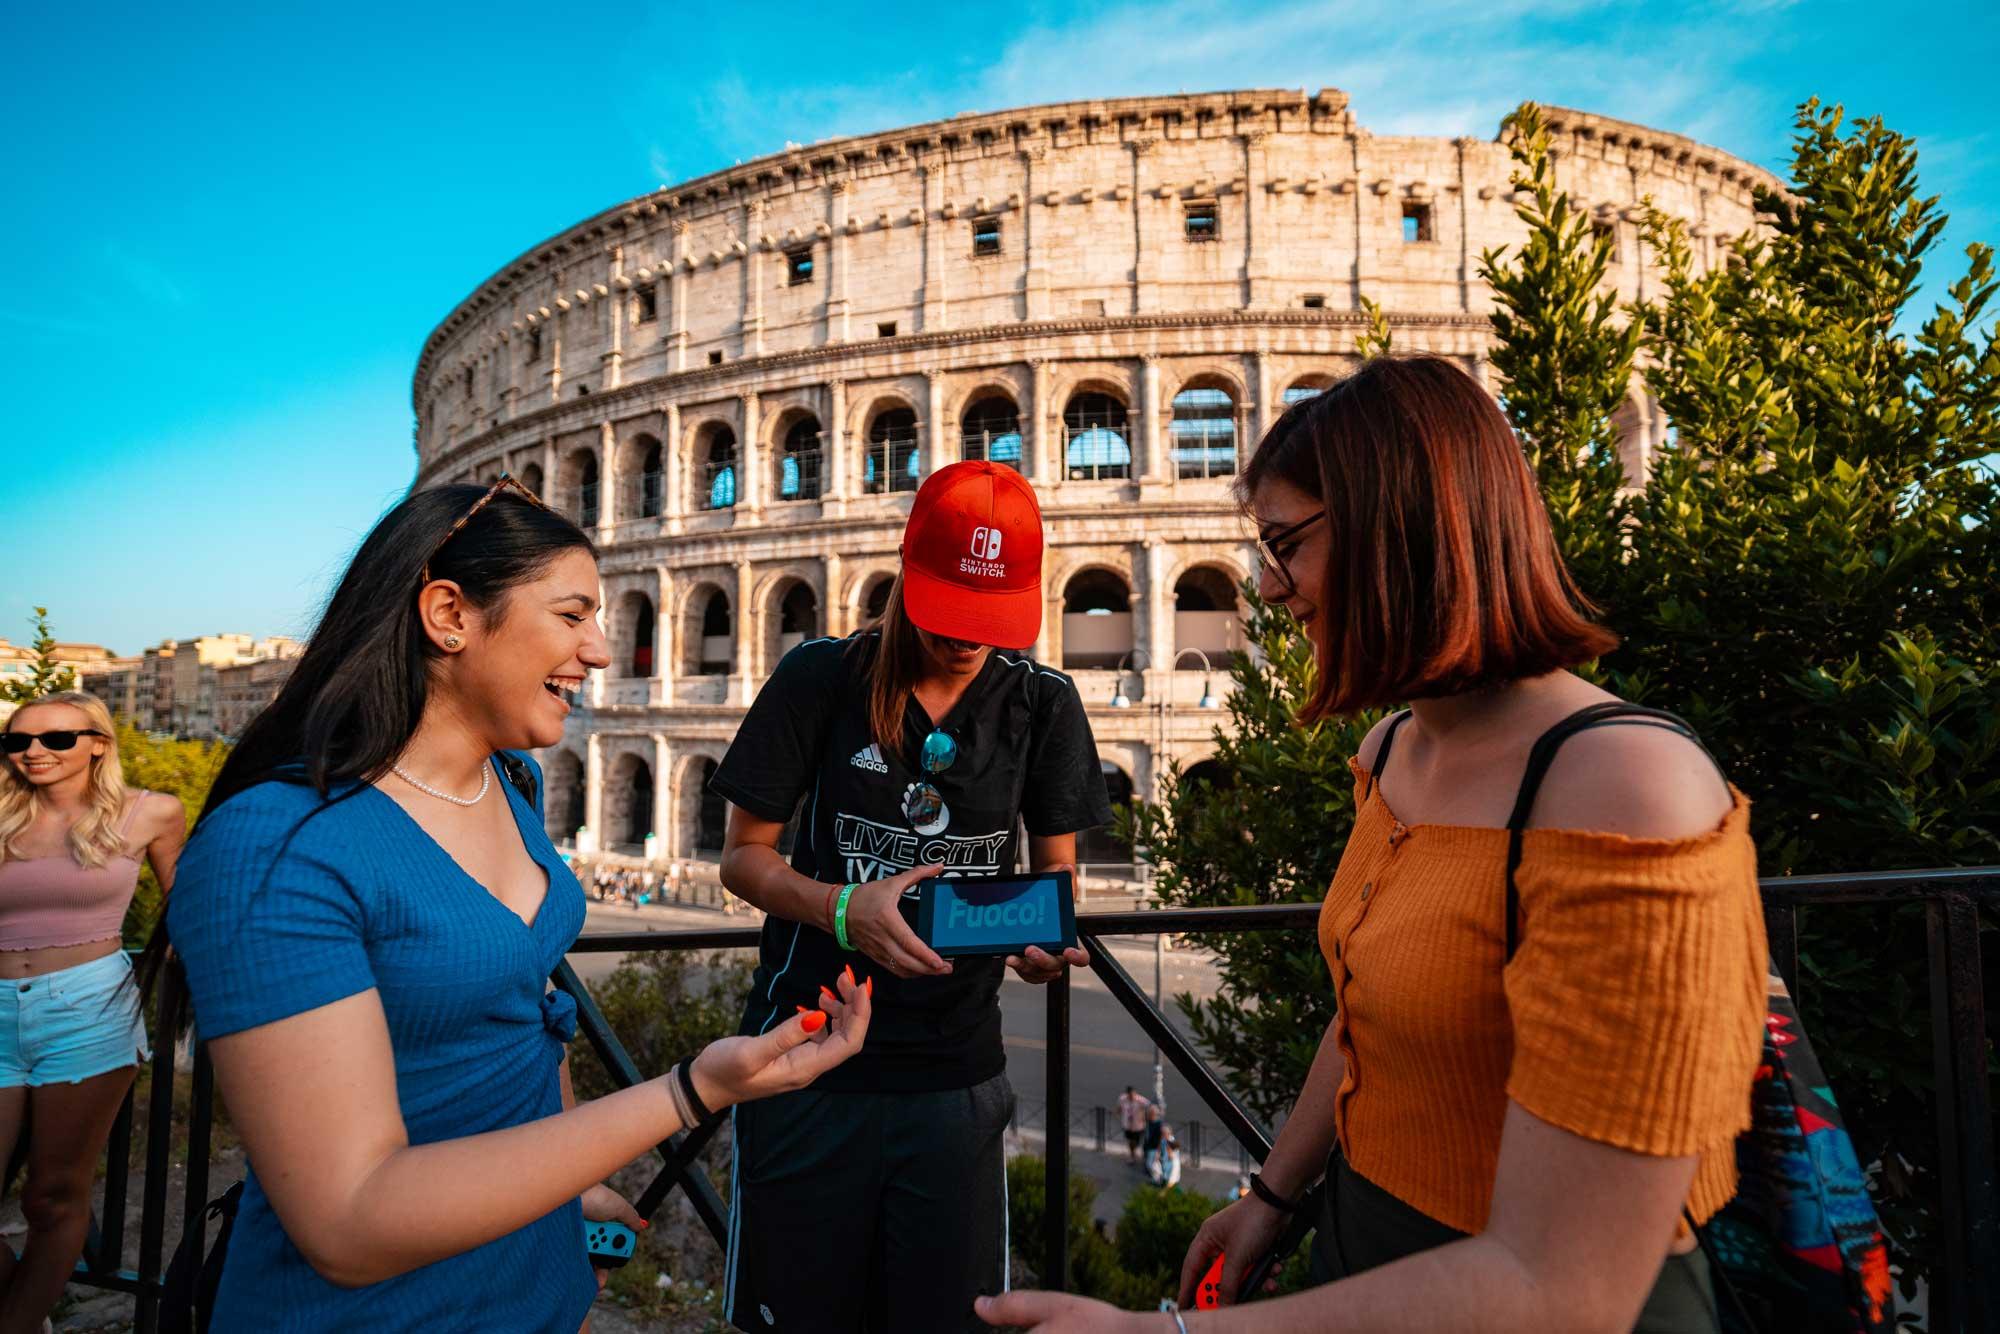 Nintendo Mi Games 2019 test prodotto a Roma